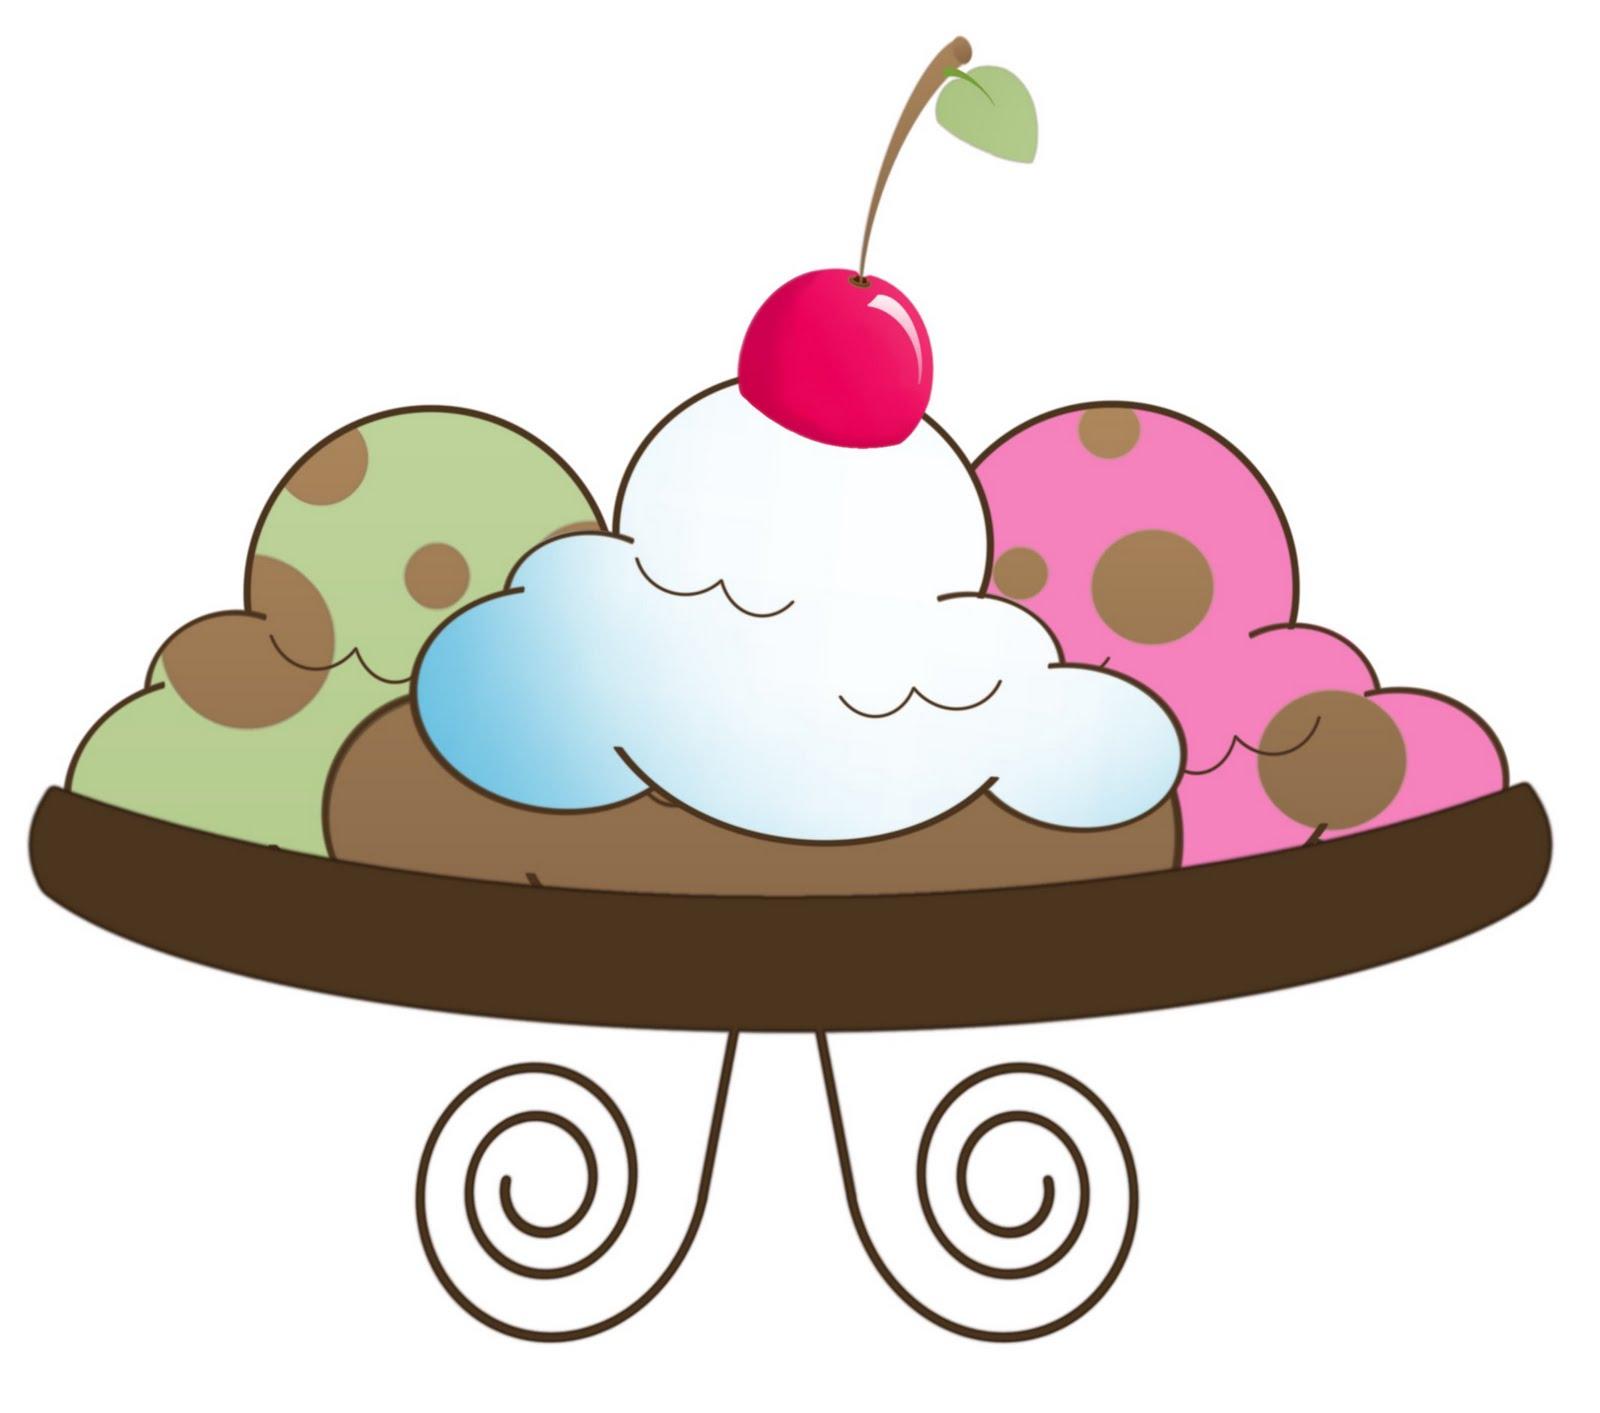 Ice cream sundae clipart cliparts 4